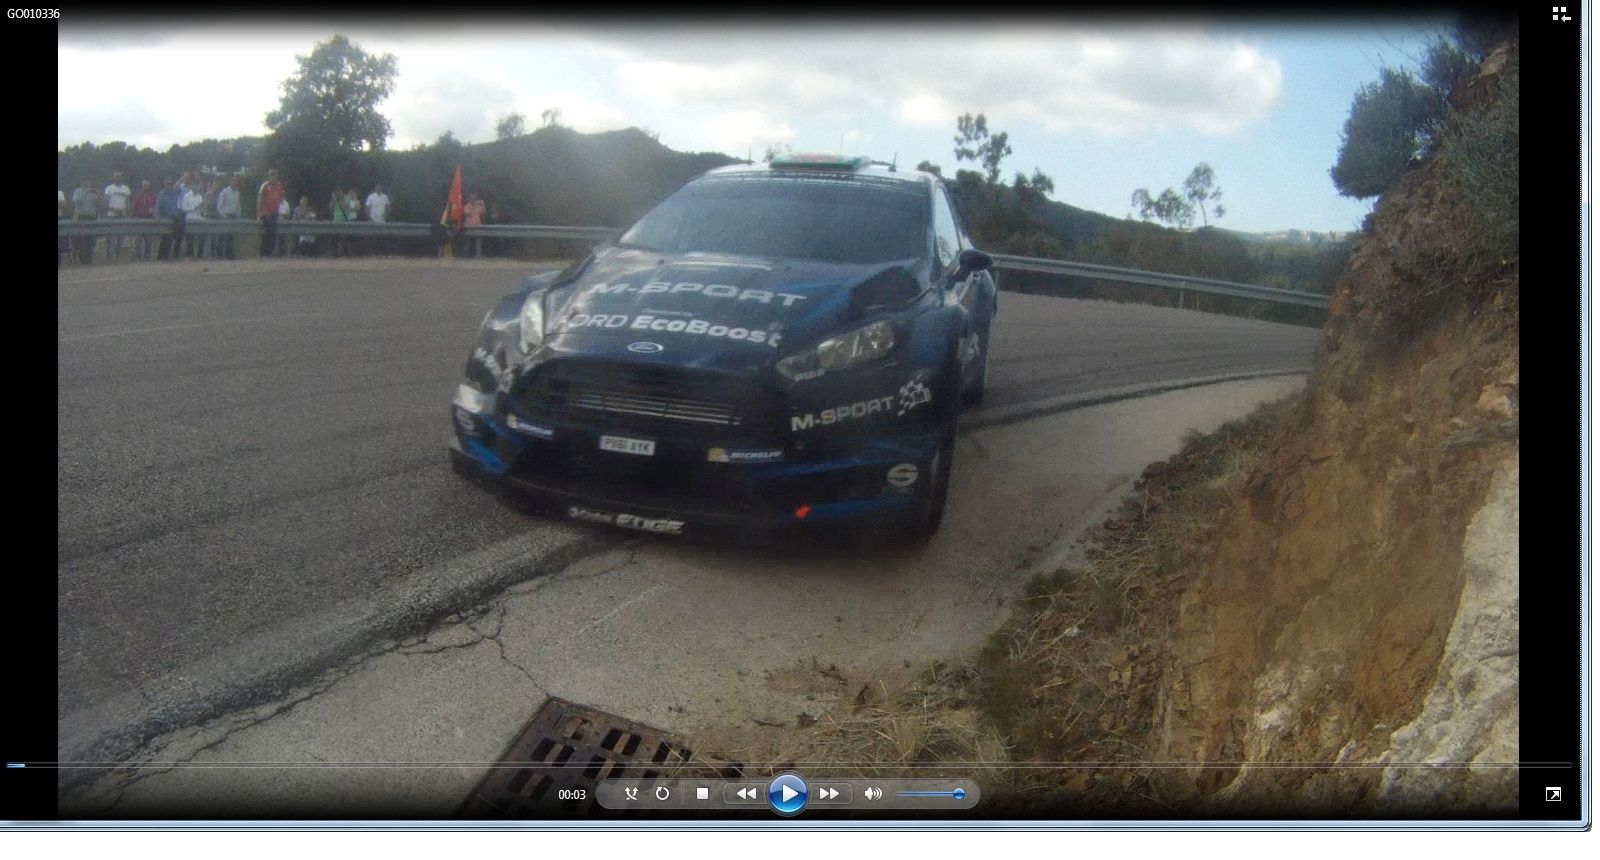 Quedada RaulGuerrero91 y Ruvigas   Rally España  Catalunya-Costa Daurada 2014 Polo12